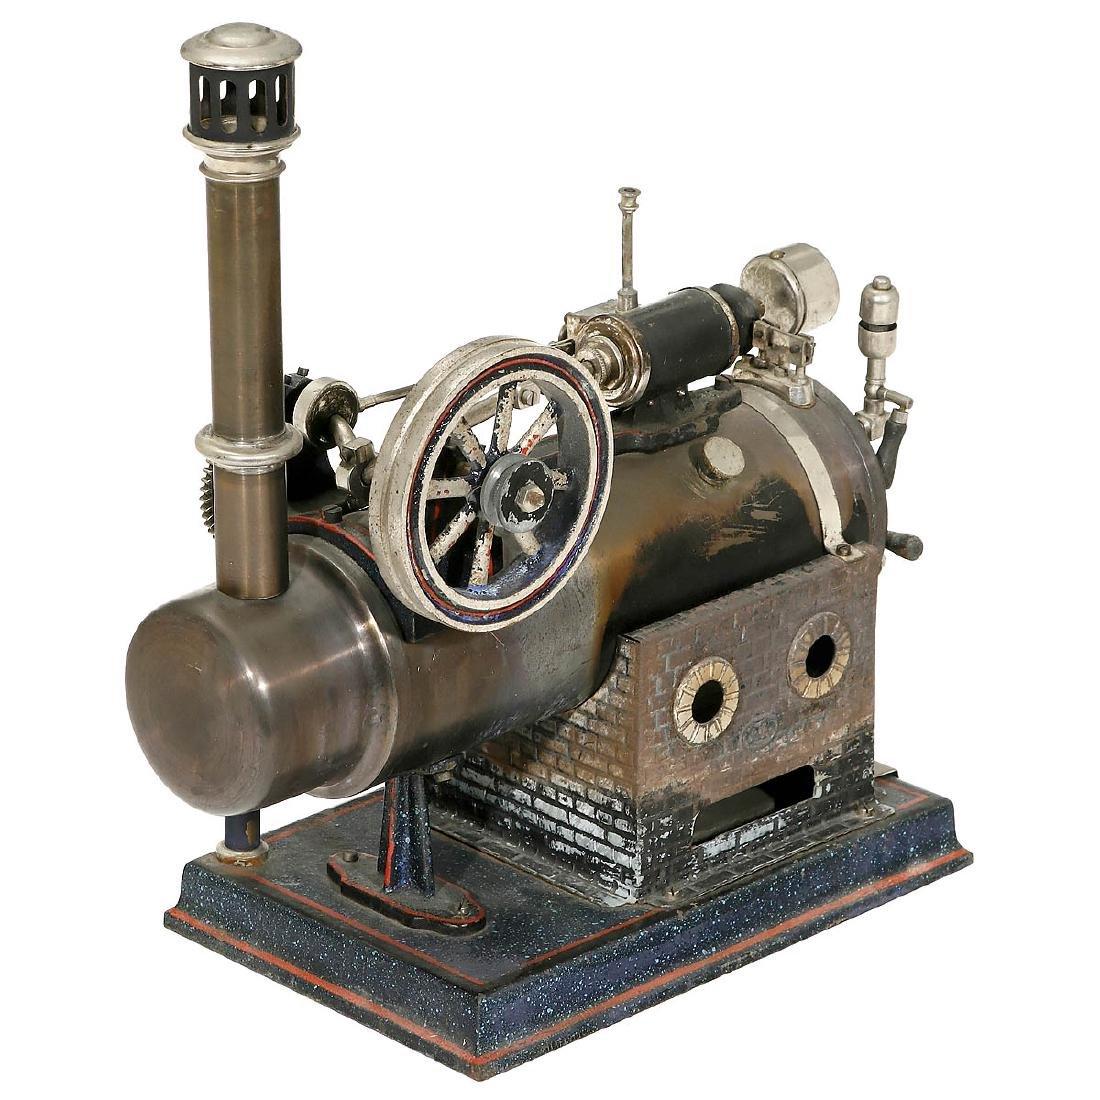 Falk 491 Stationary Steam Tractor, c. 1920 - 2